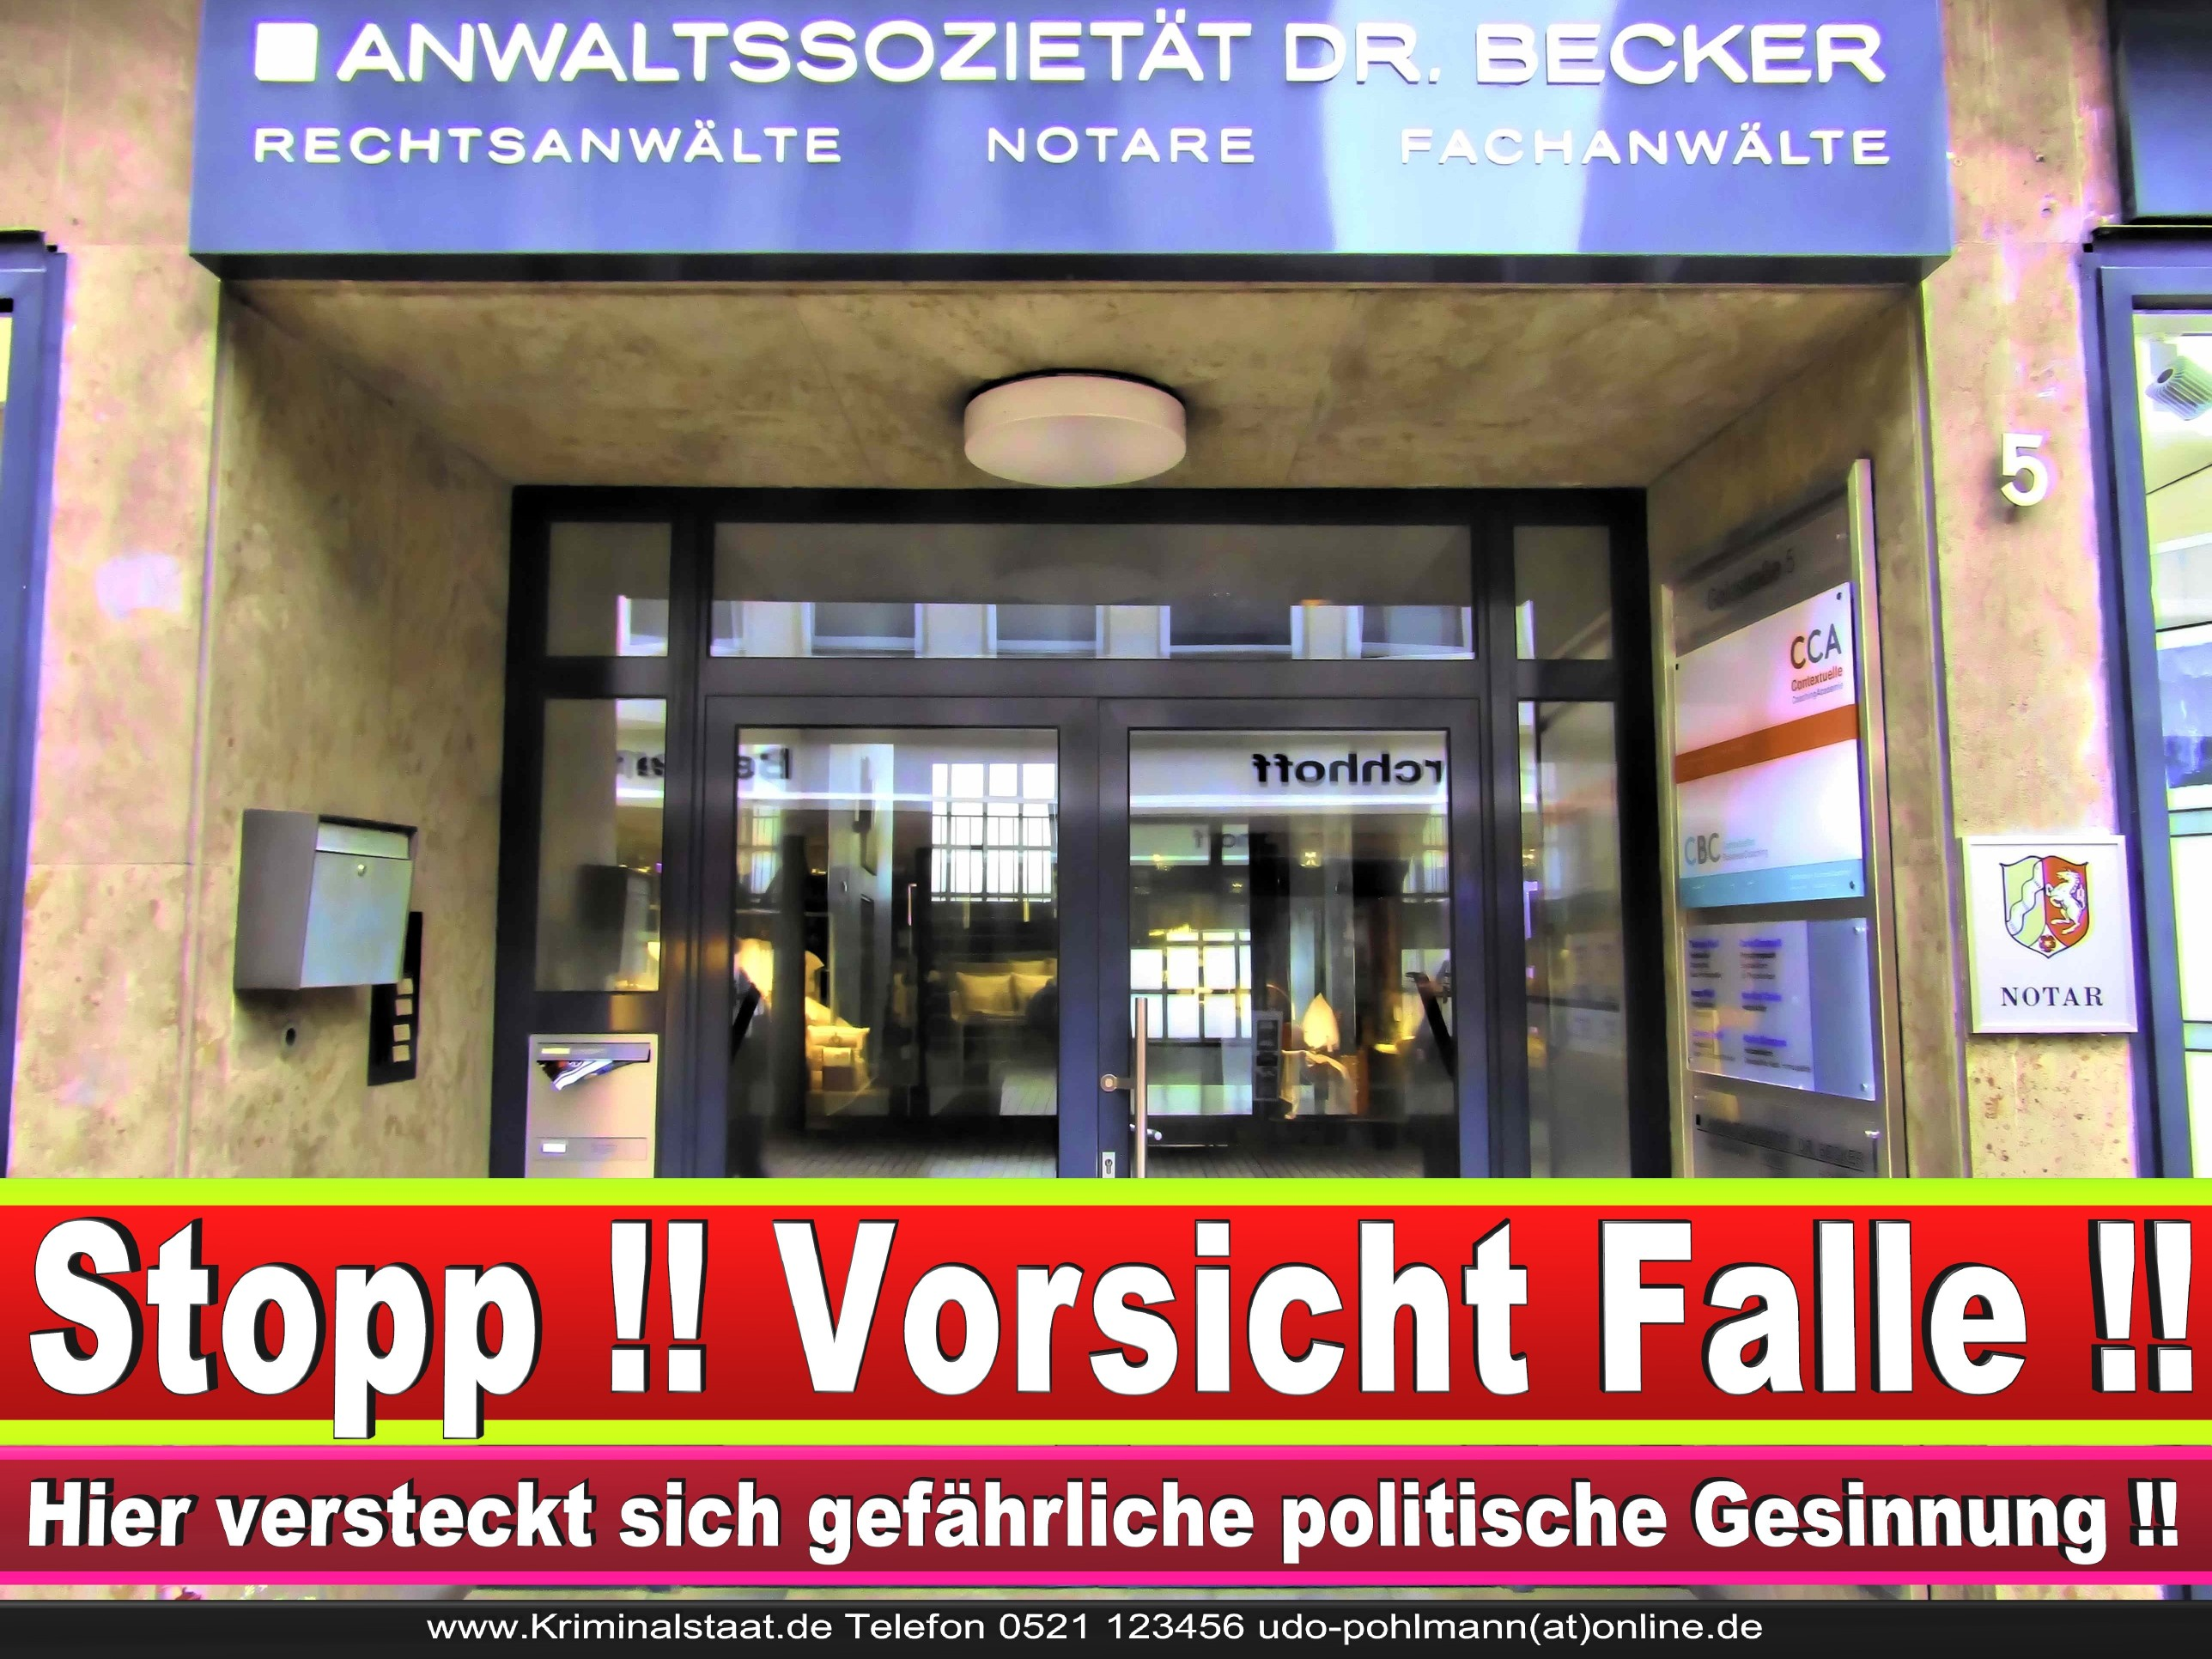 RECHTSANWALT DR THORSTEN FELDMANN CDU BIELEFELD Rechtsanwalt Und Notar A D Werner Kaup LANDTAGSWAHL BUNDESTAGSWA L BÜRGERMEISTER AHL NRW 2